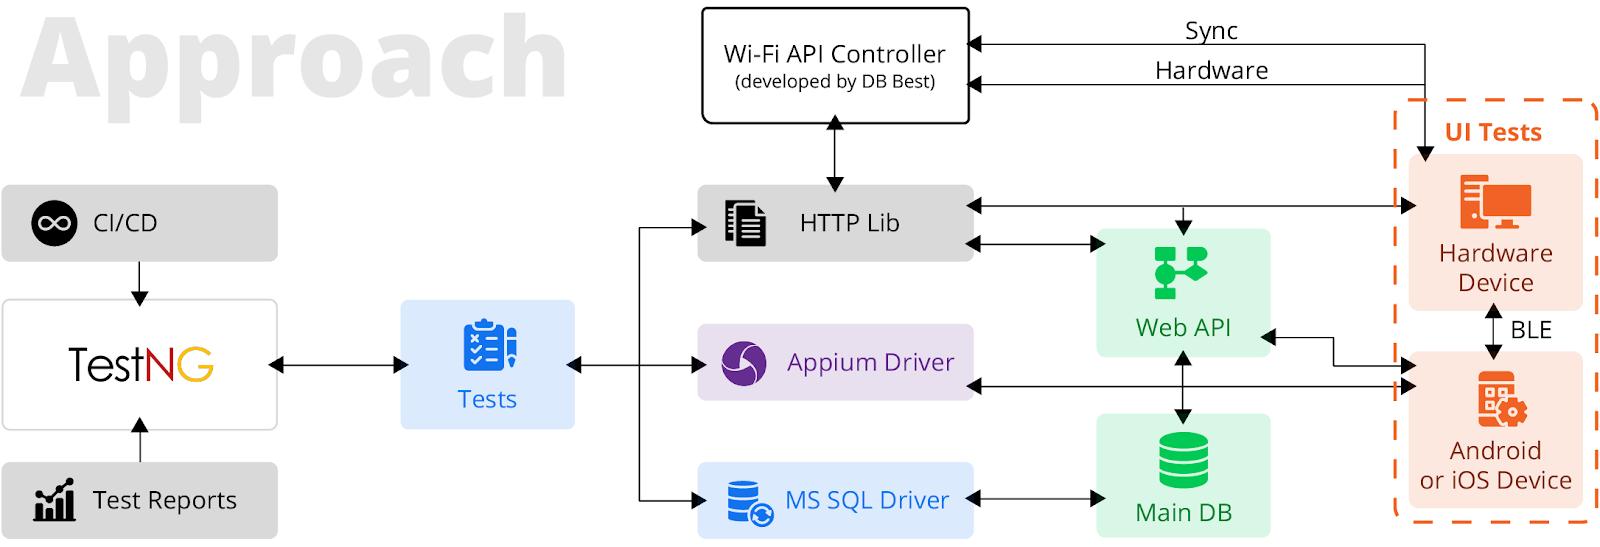 mobile-hardware-automation-testing